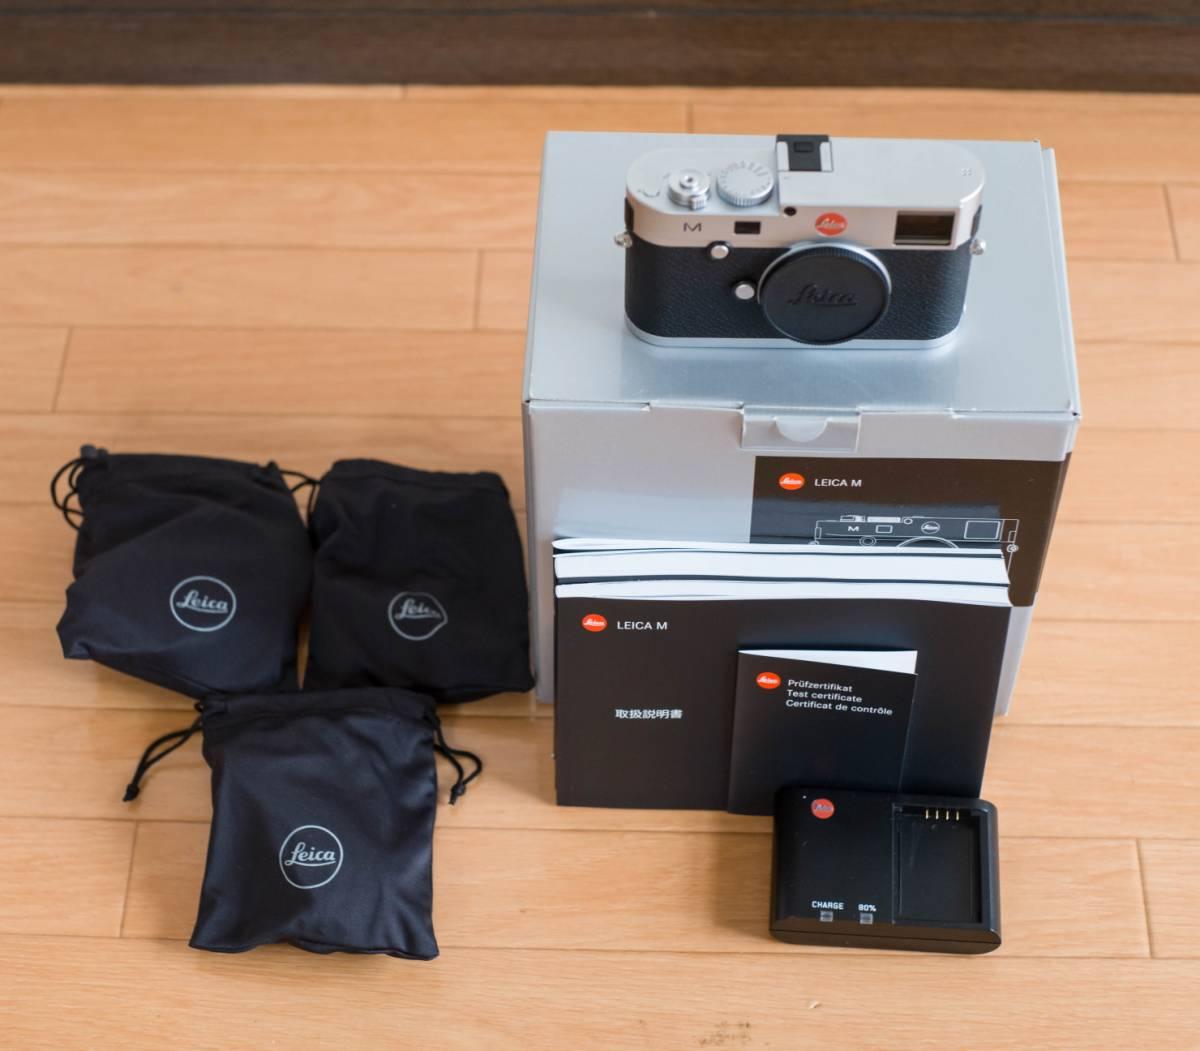 Leica ライカ M Type240 シルバークローム 美品 付属品 元箱 完備